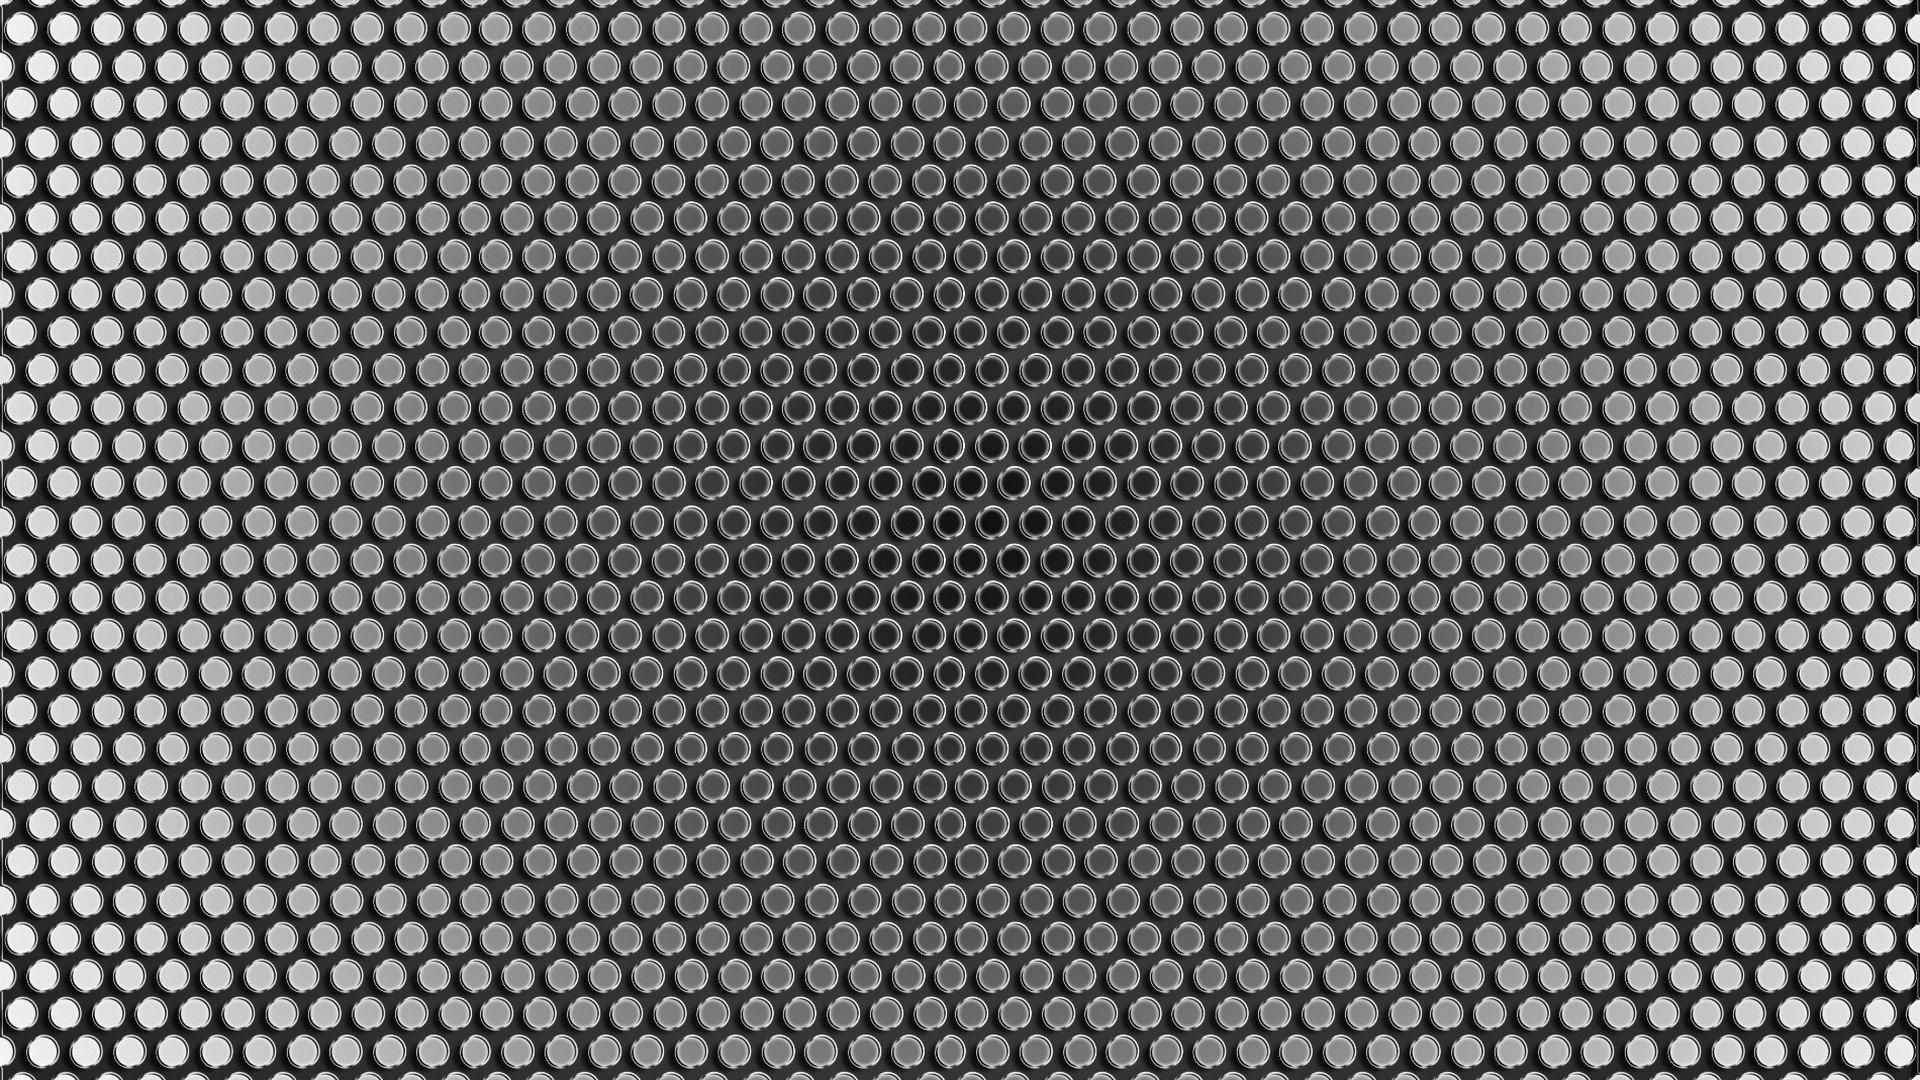 metal patterns templates textures metallic wallpaper background 1920x1080